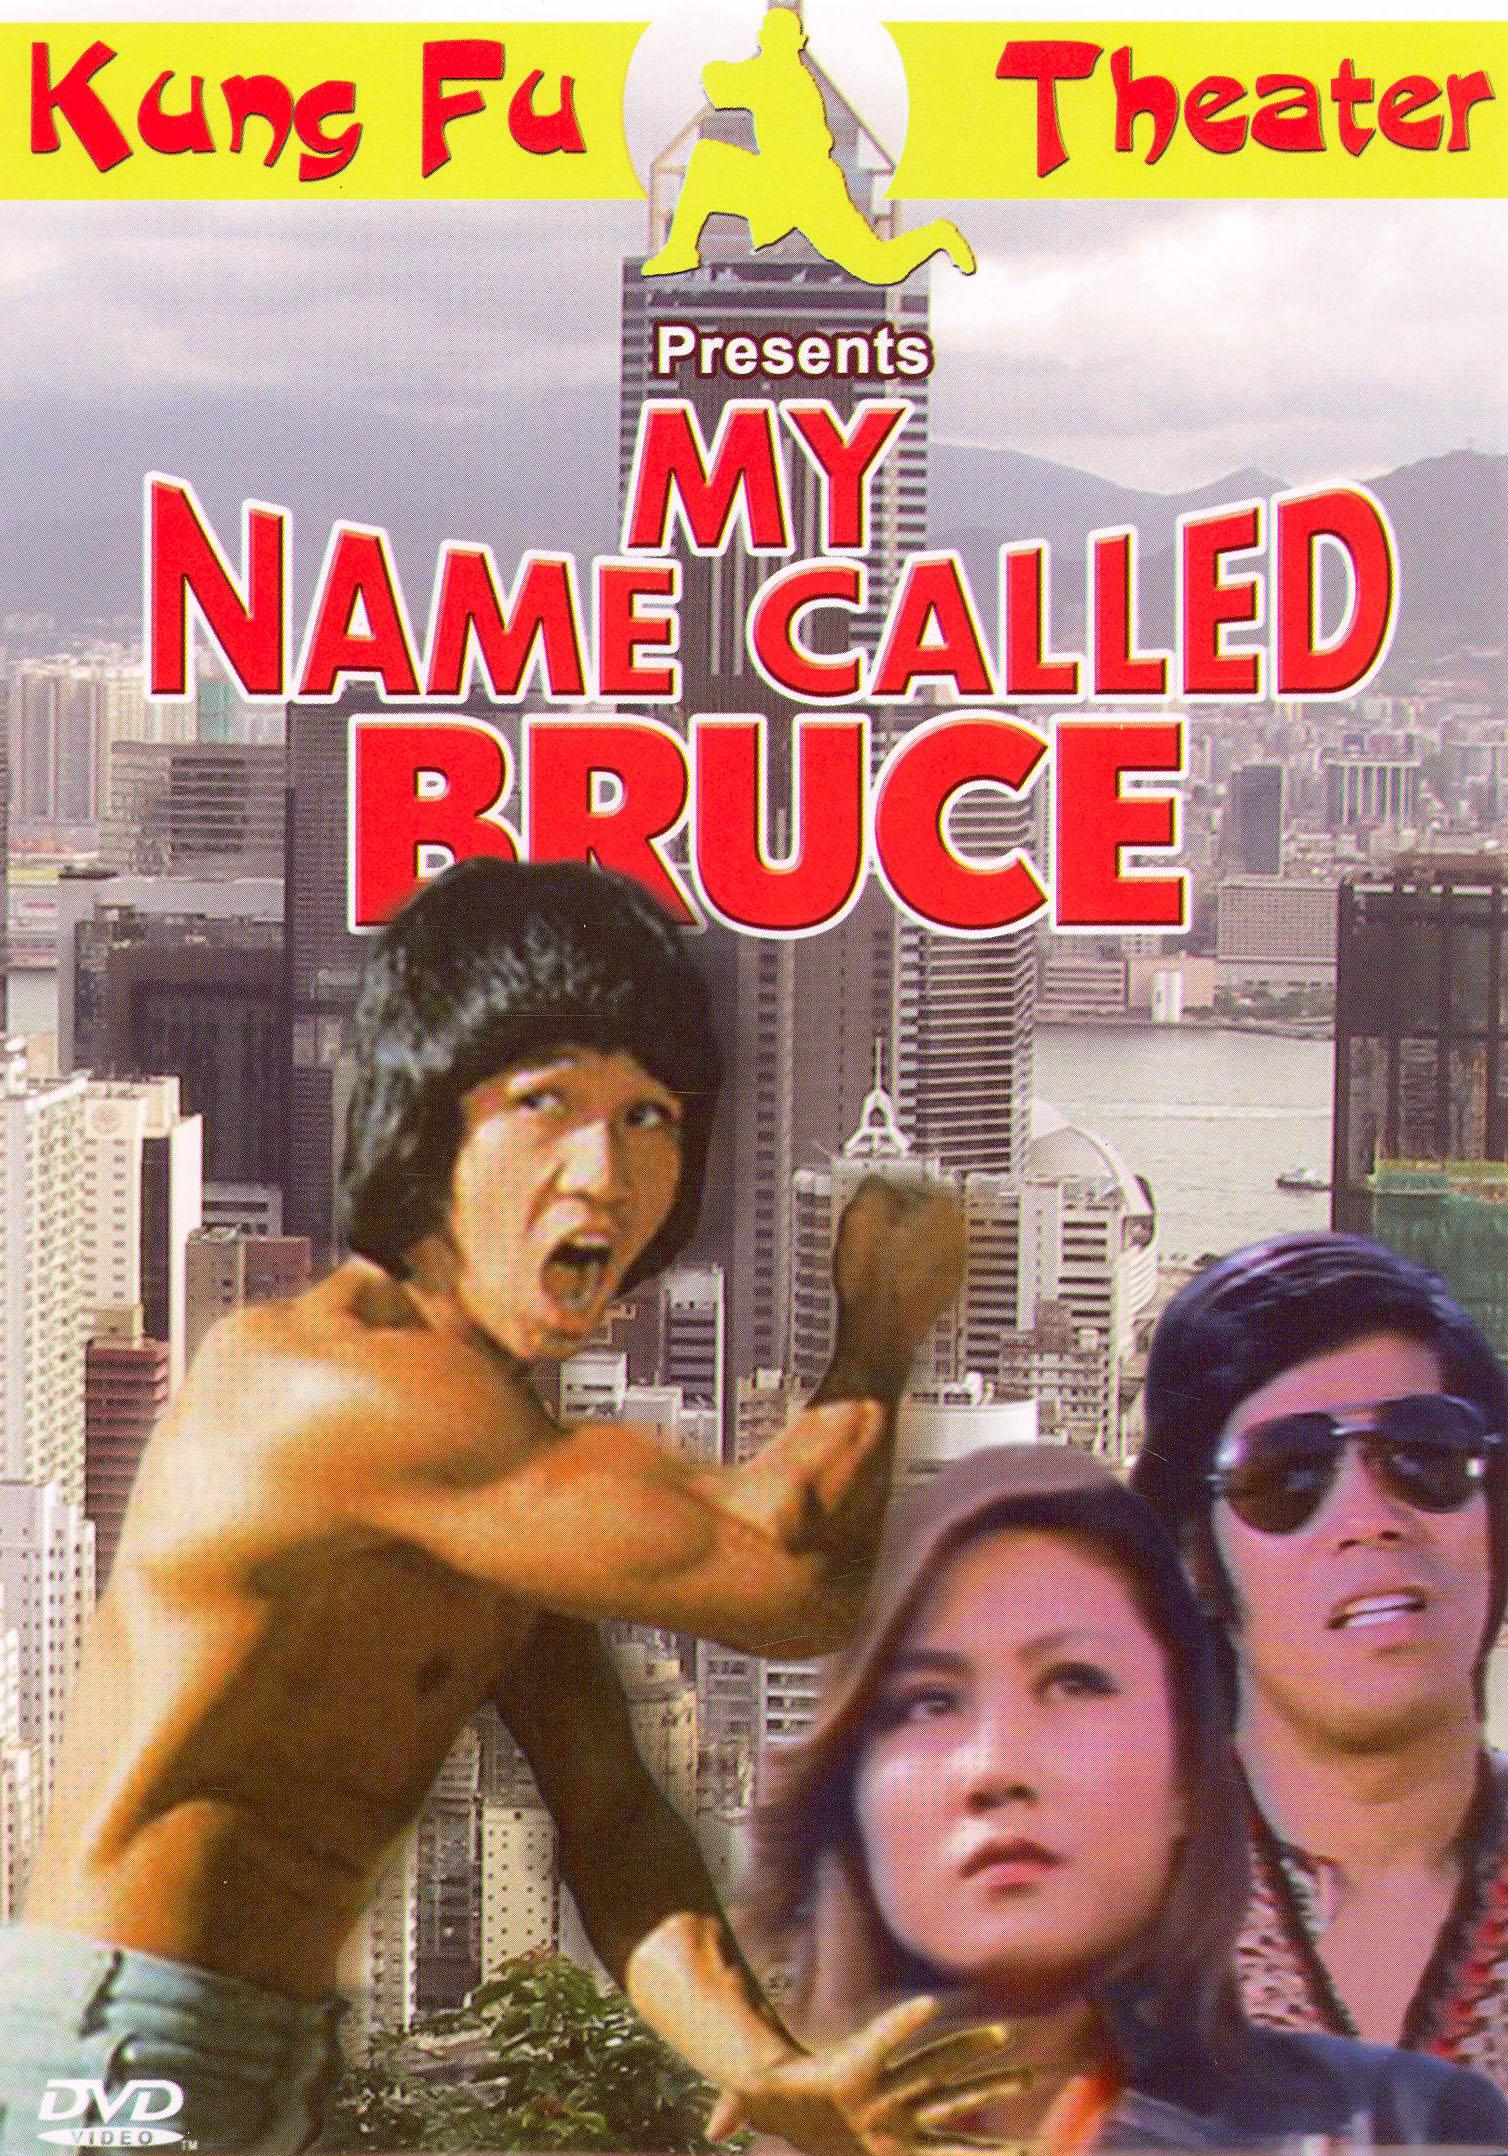 My Name Called Bruce